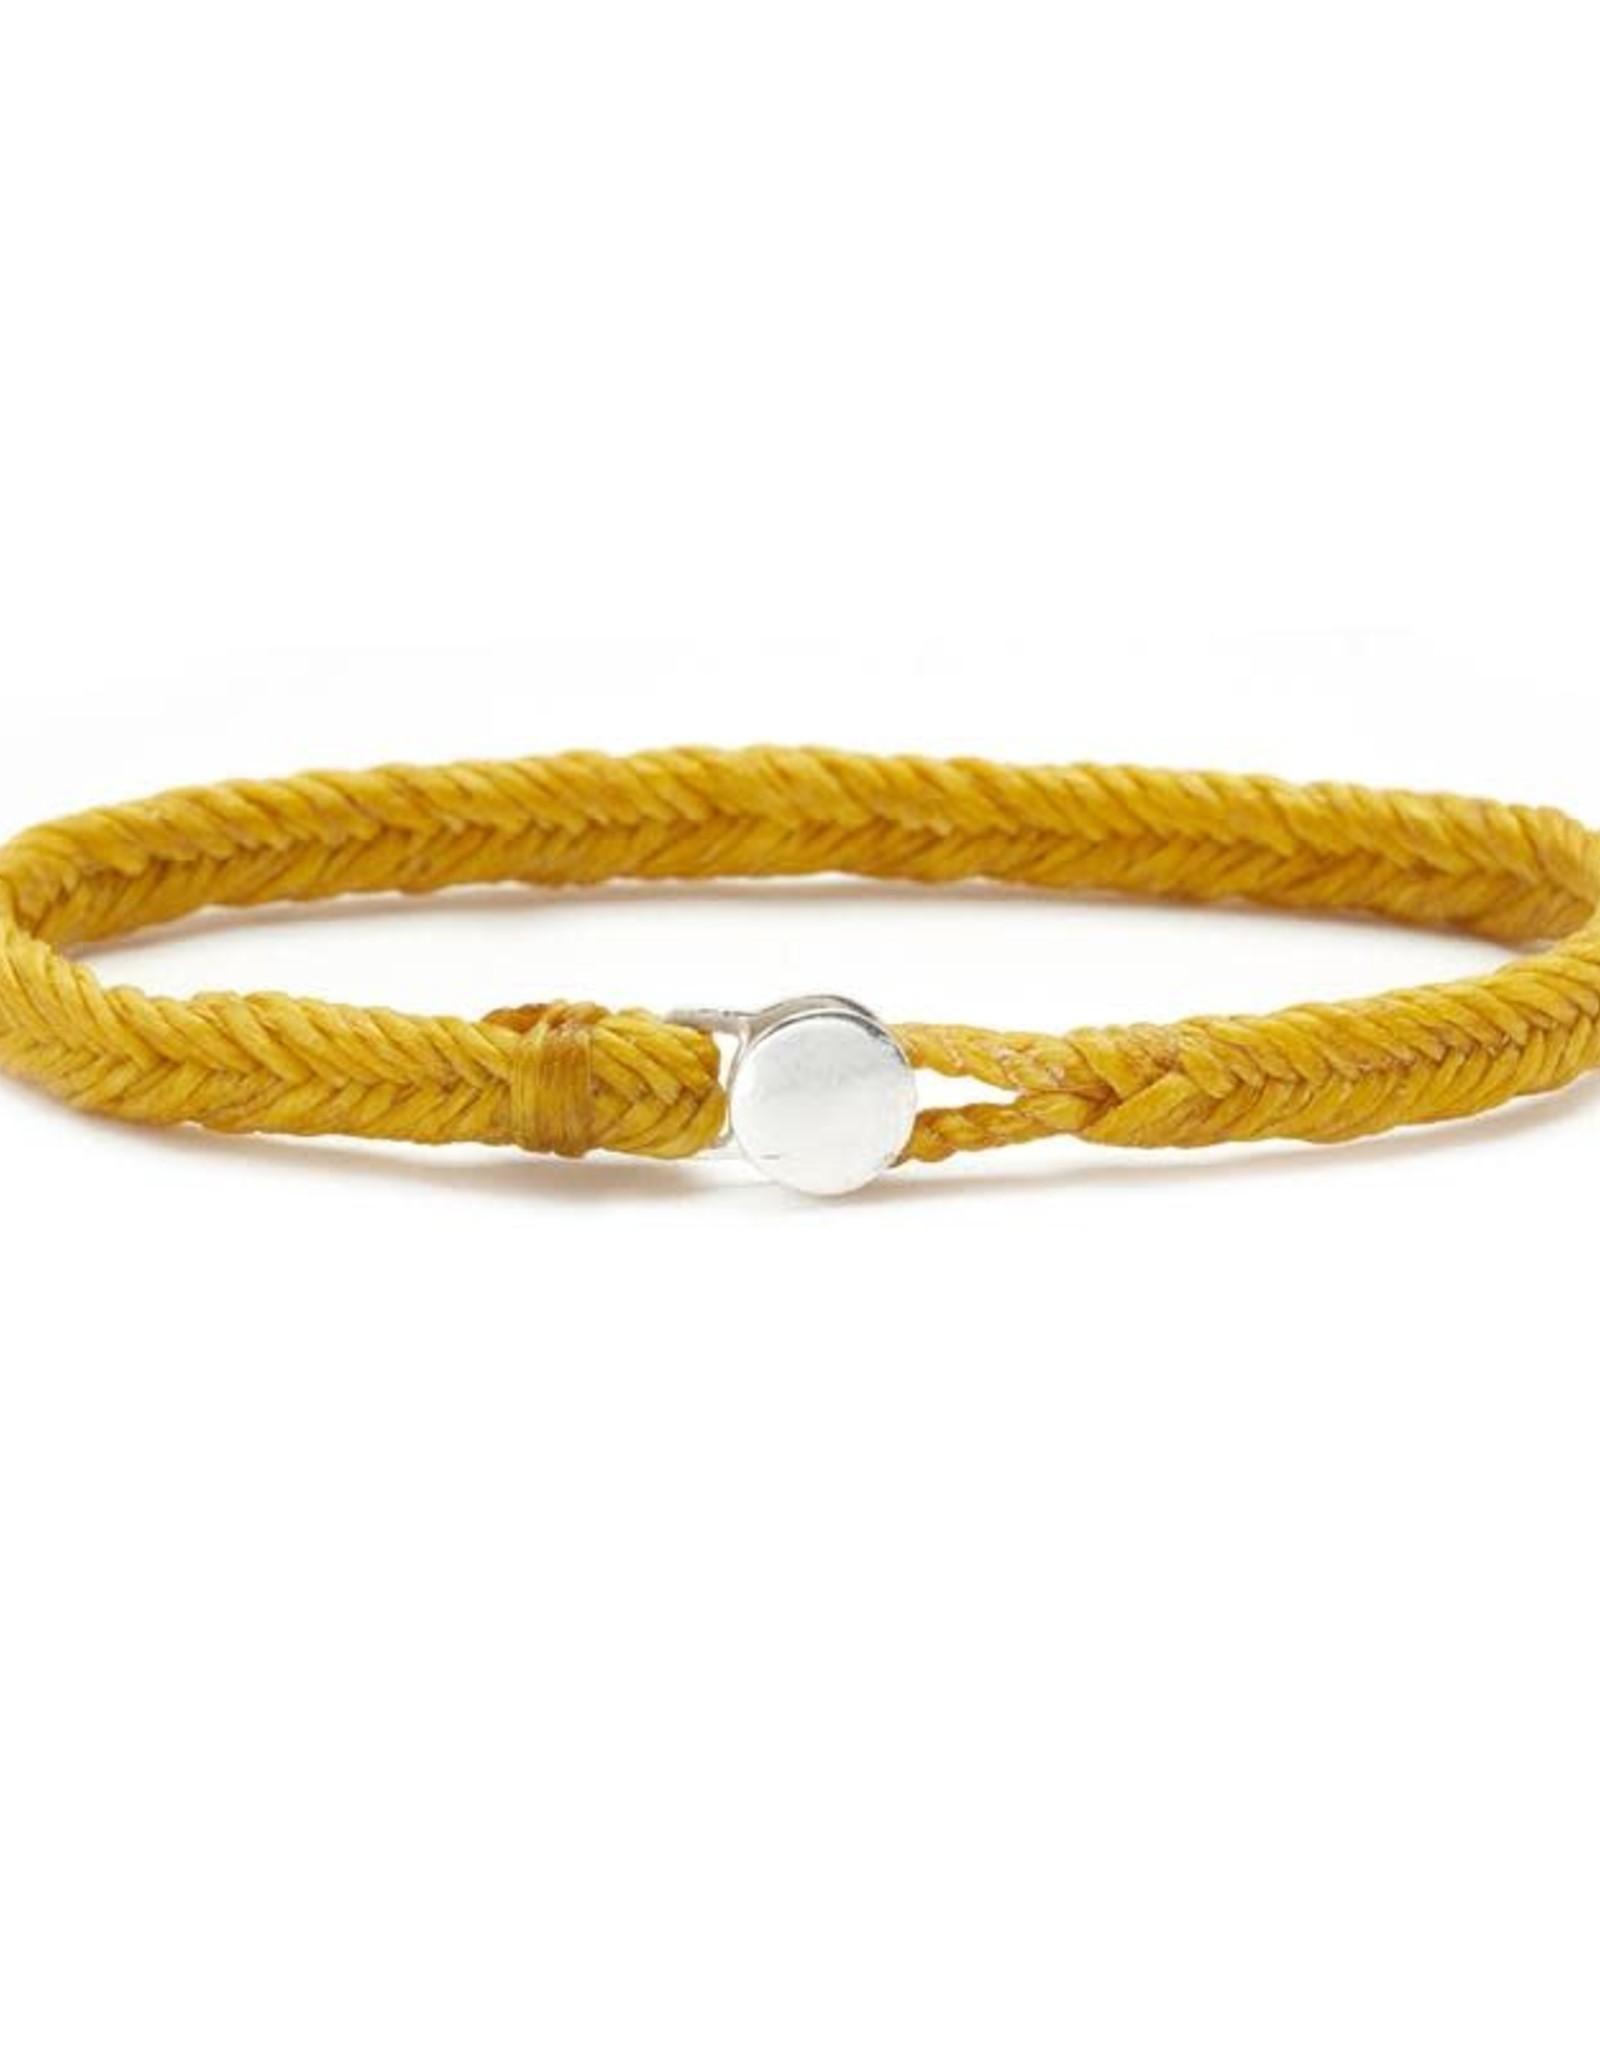 Scosha Fishtail Button Silver Bracelet - Mimosa